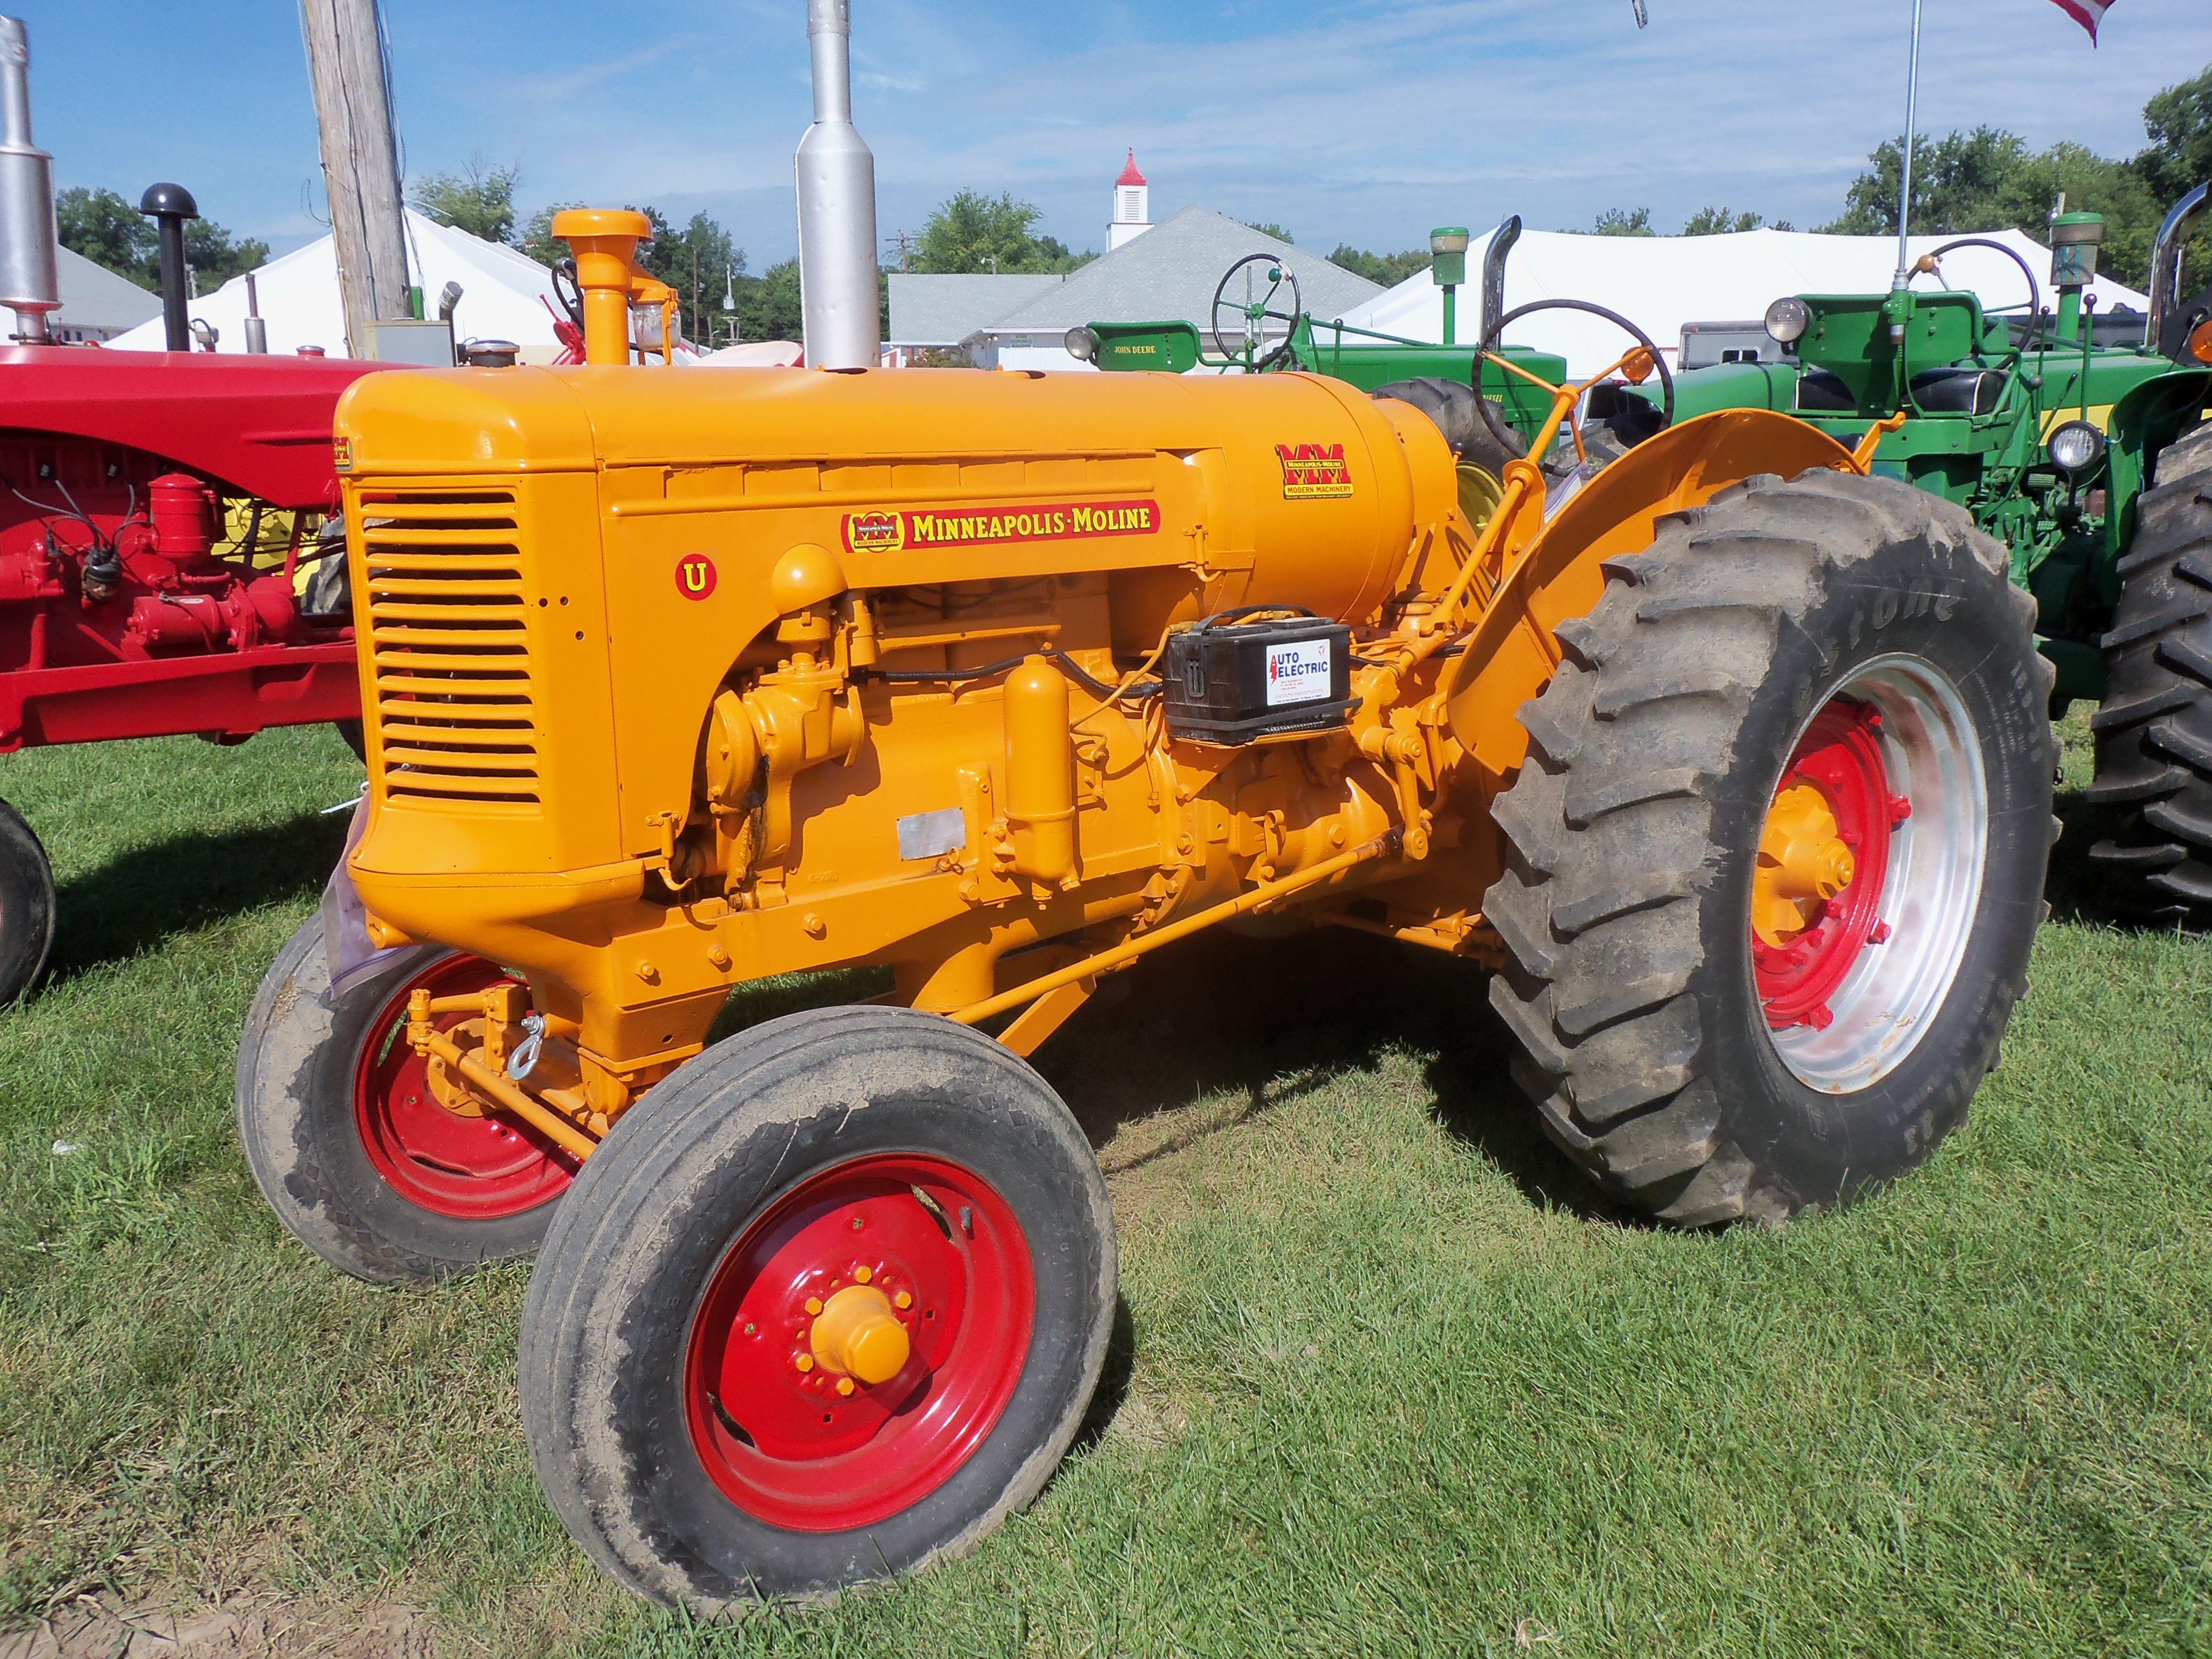 Minneapolis Moline Models : Minneapolis moline model u oliver tractors